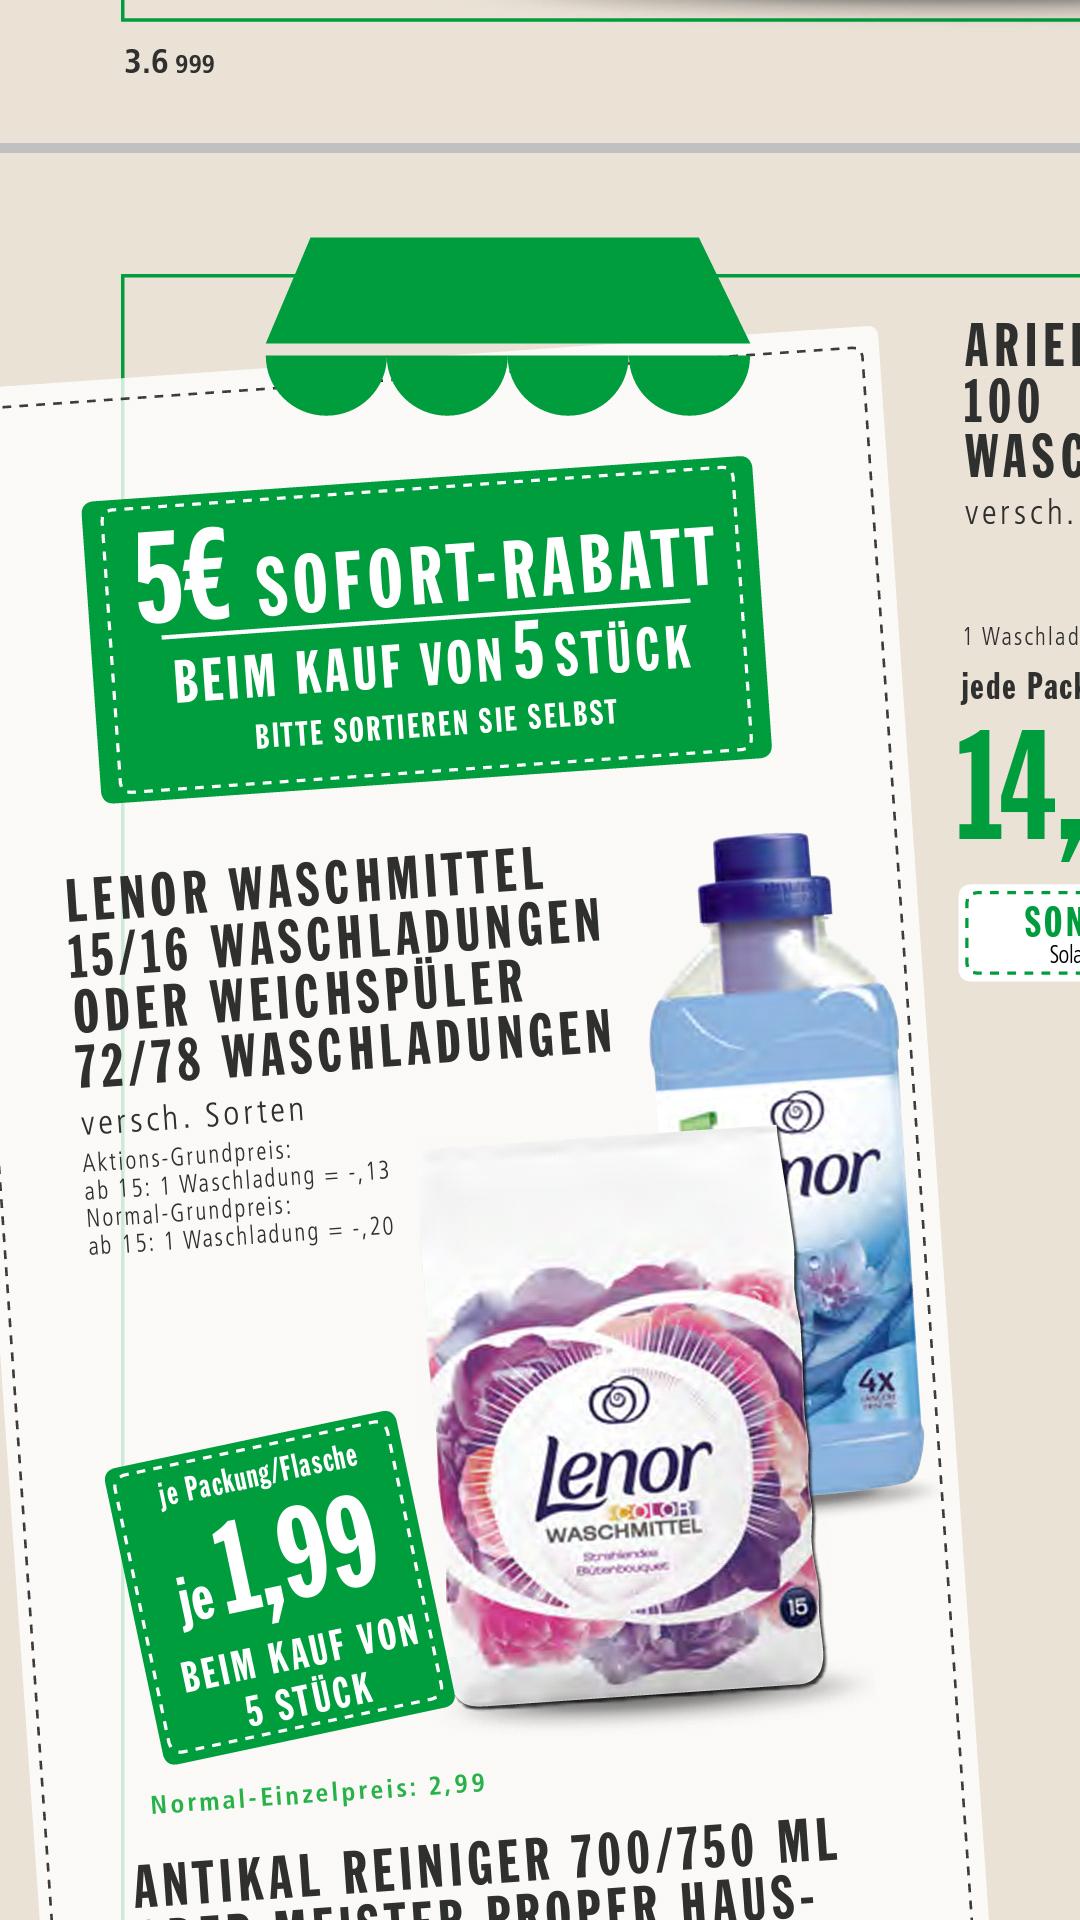 Lokal, Lenor Weichspüler 1,99€ je Flasche (bei 5 Flaschen) in Markthalle Krefeld (Real)